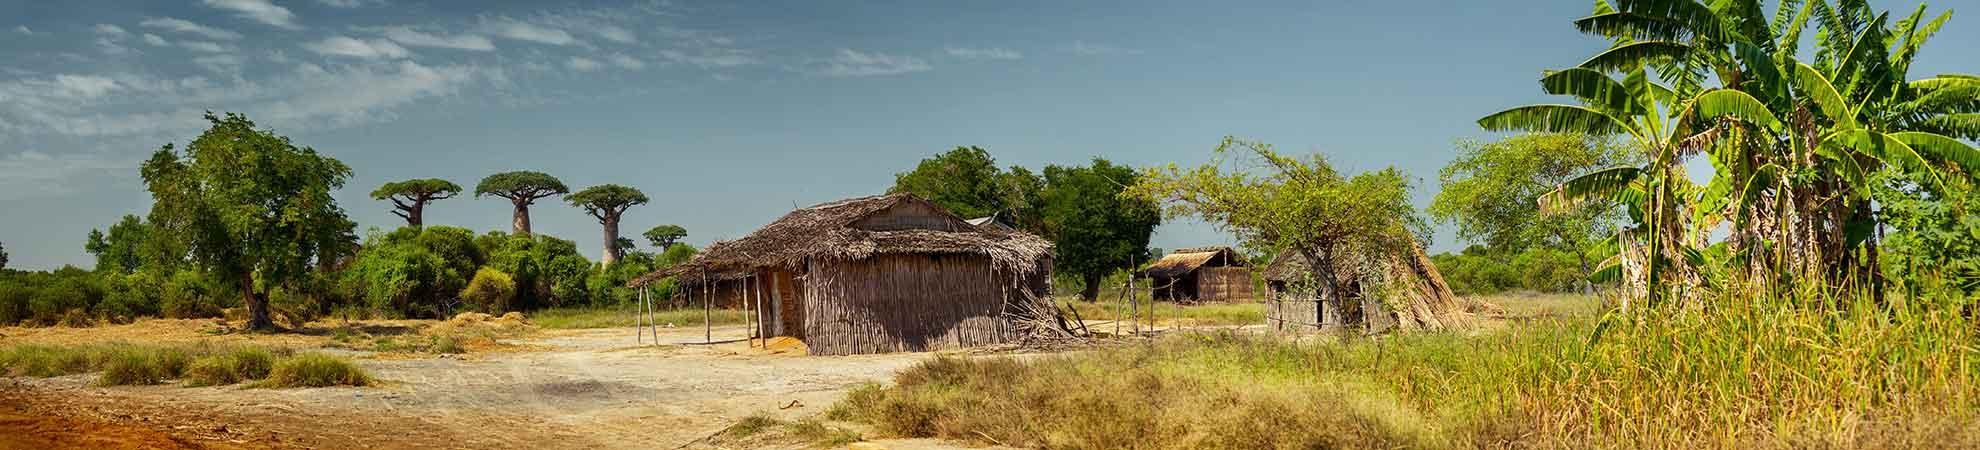 Fiche pays Madagascar